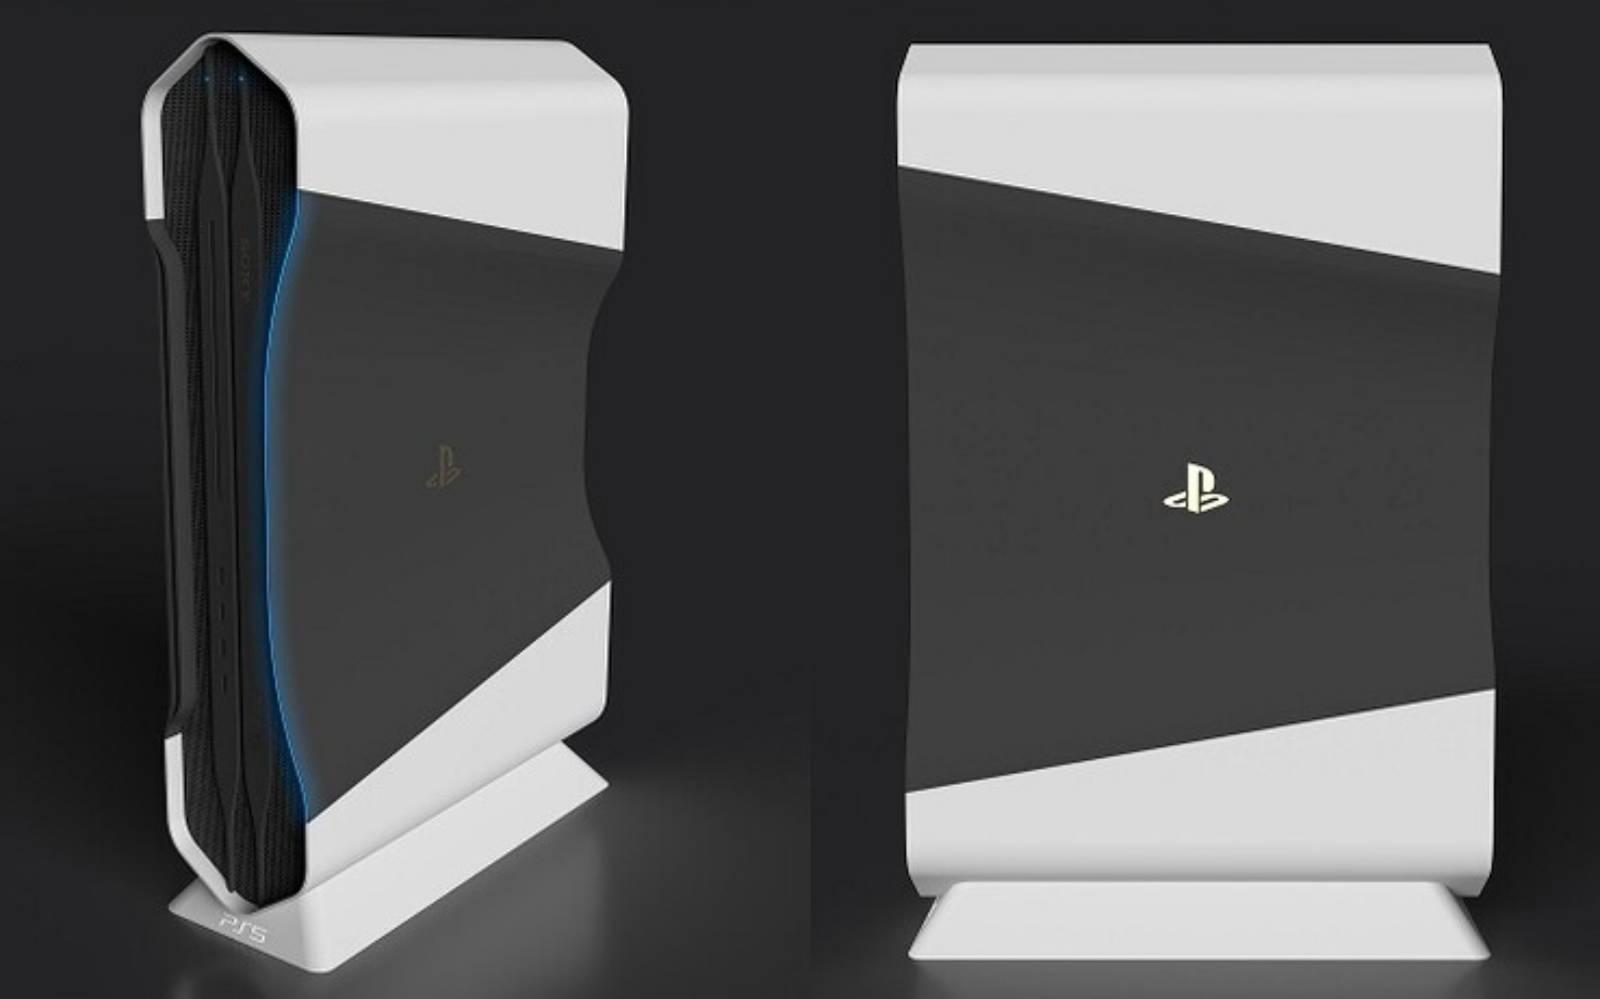 Playstation 5 mai